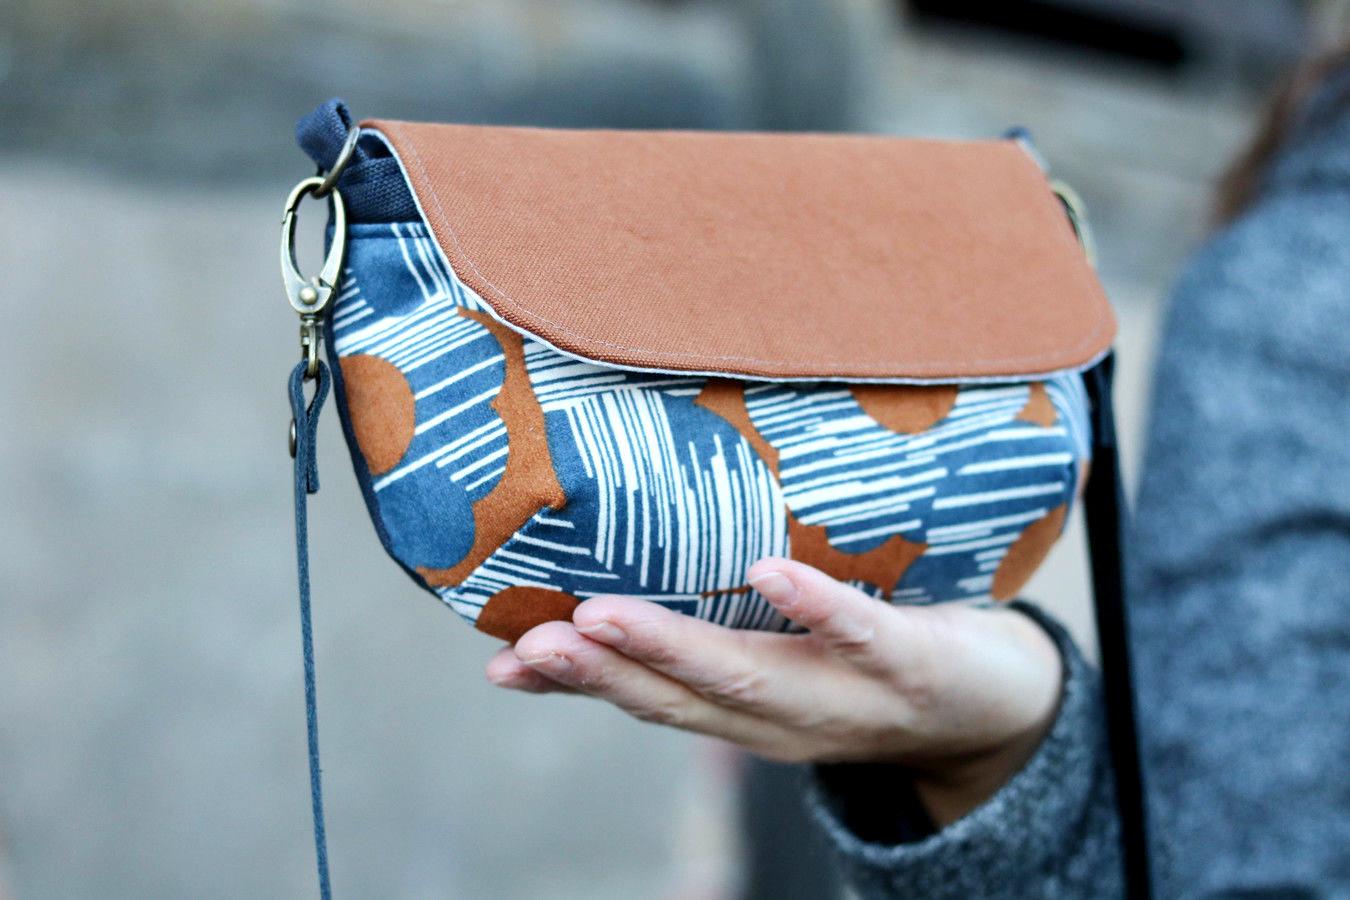 Tolle-Taschen-selber-nähen-29-Schnittmuster-mit-Anleitung-Eleni-Bag